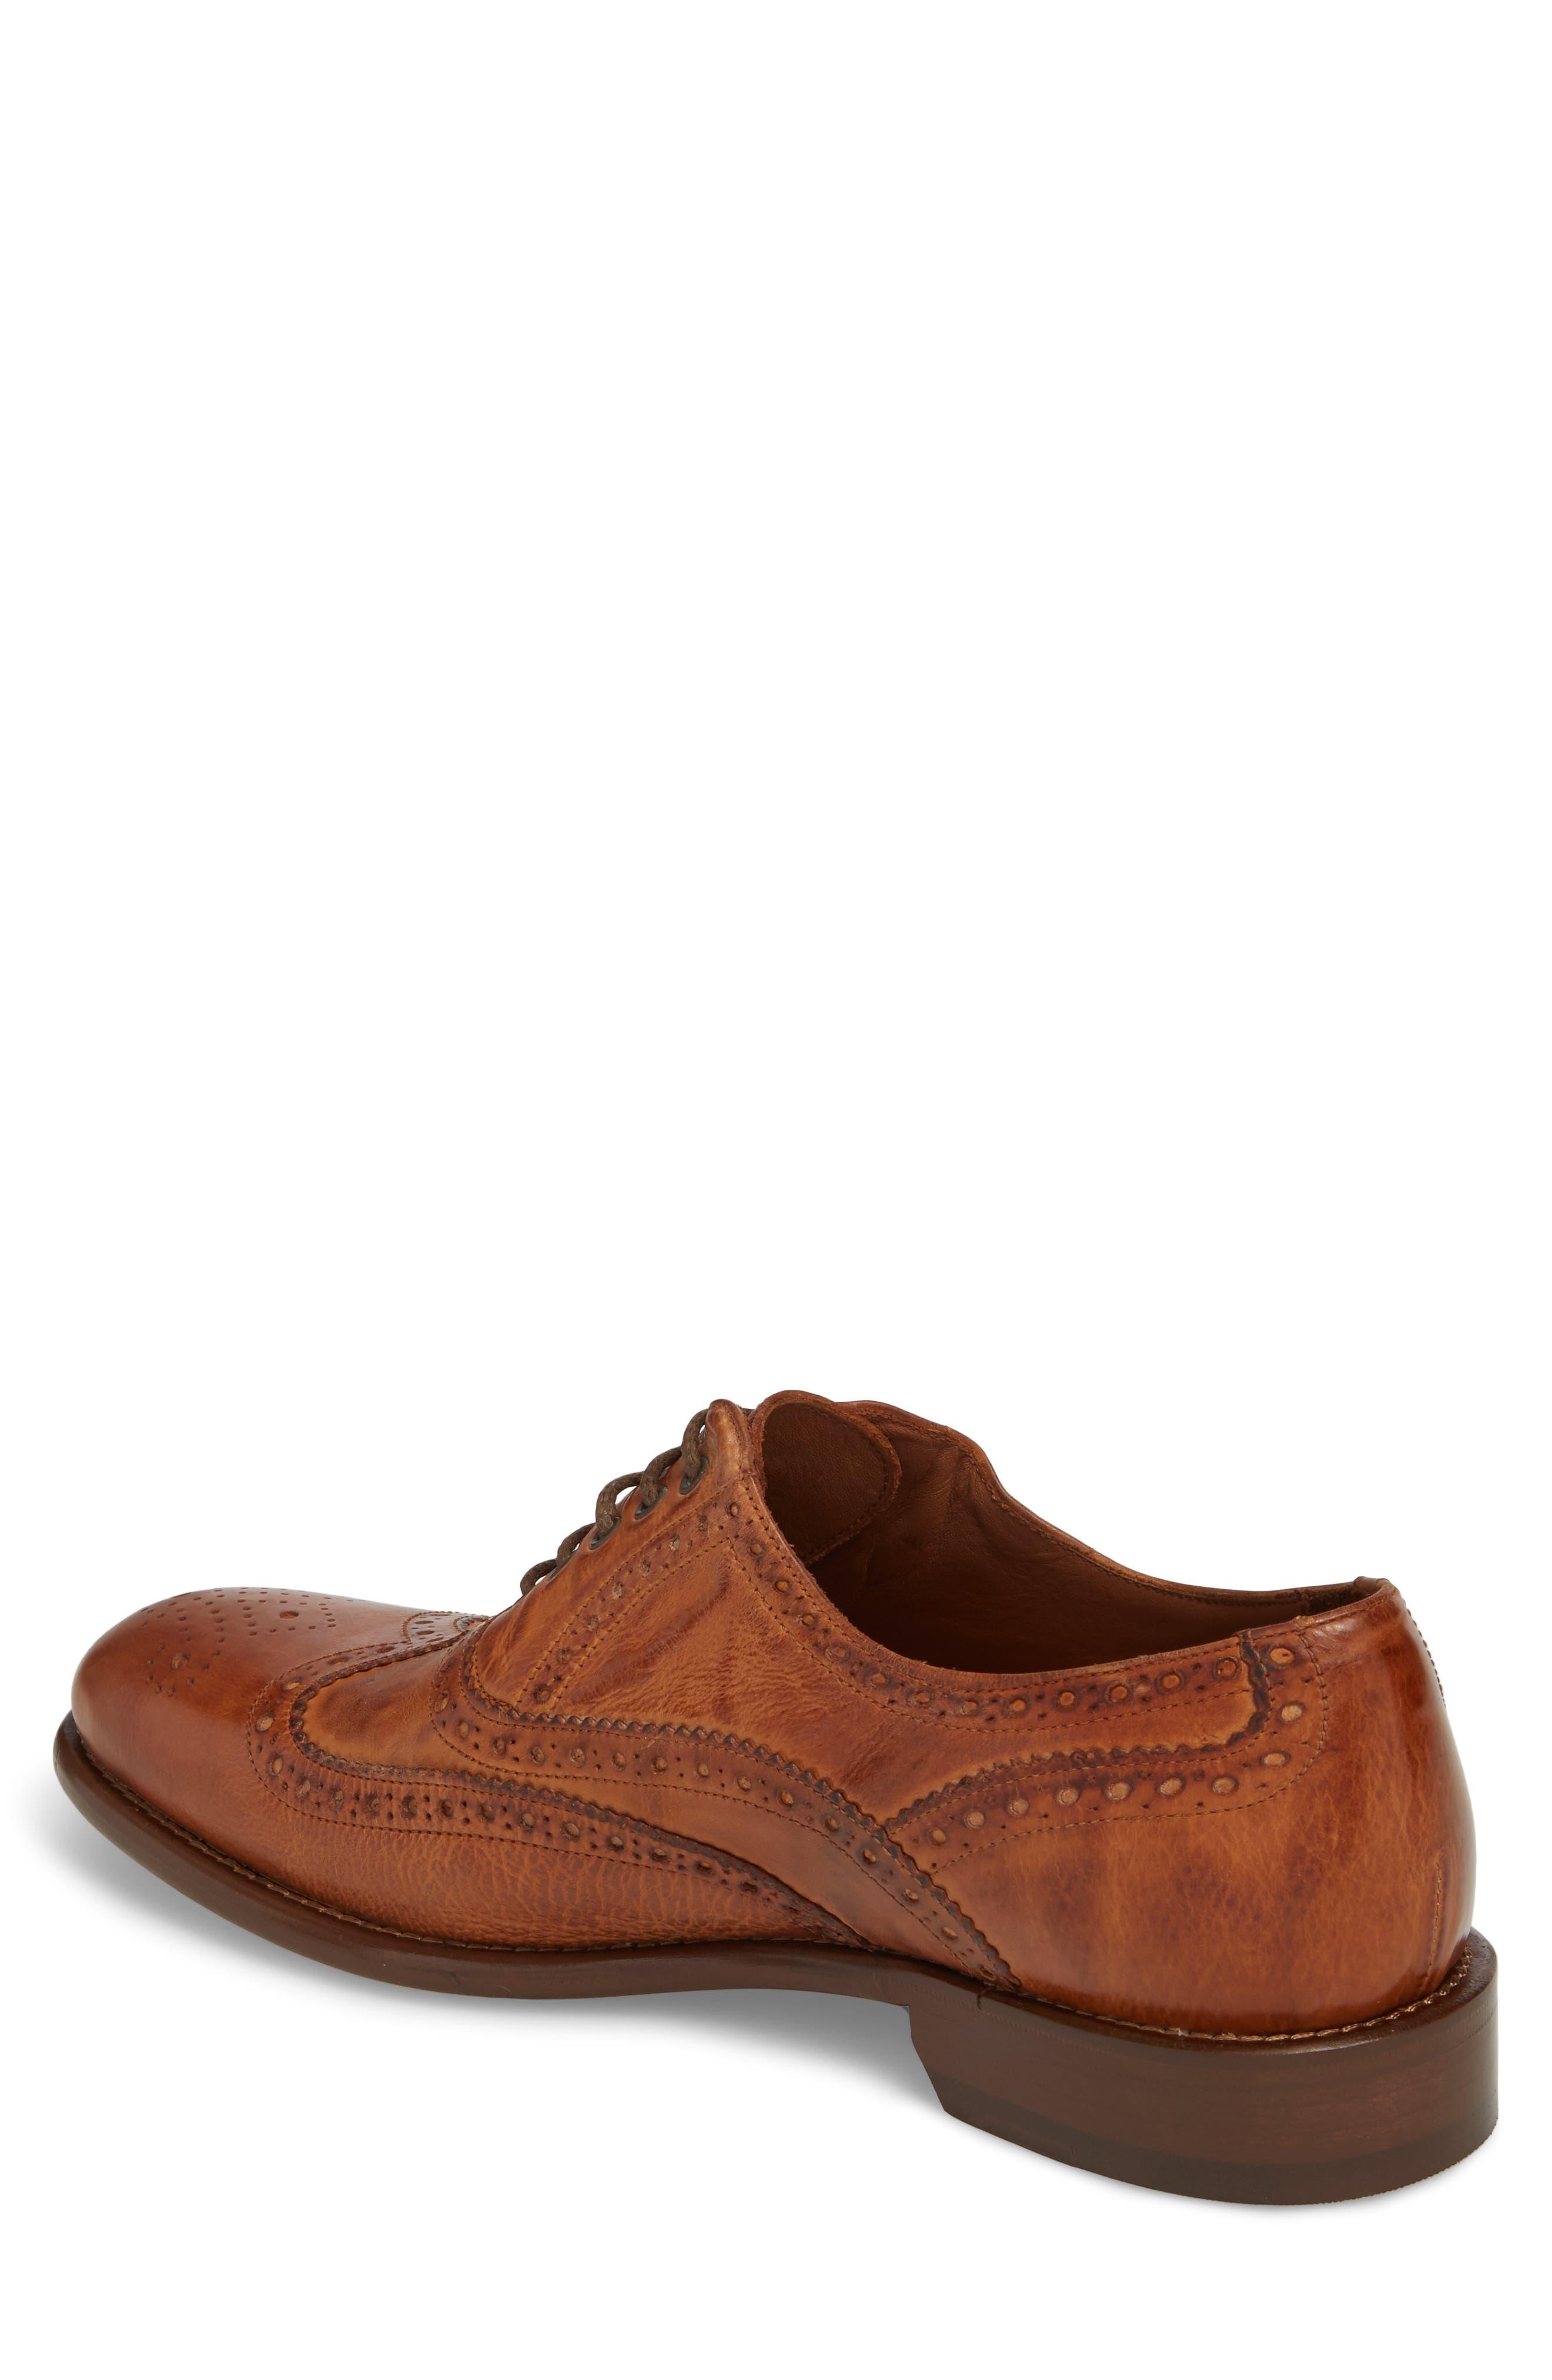 Bryson Wingtip Oxford,                             Alternate thumbnail 2, color,                             Cognac Leather